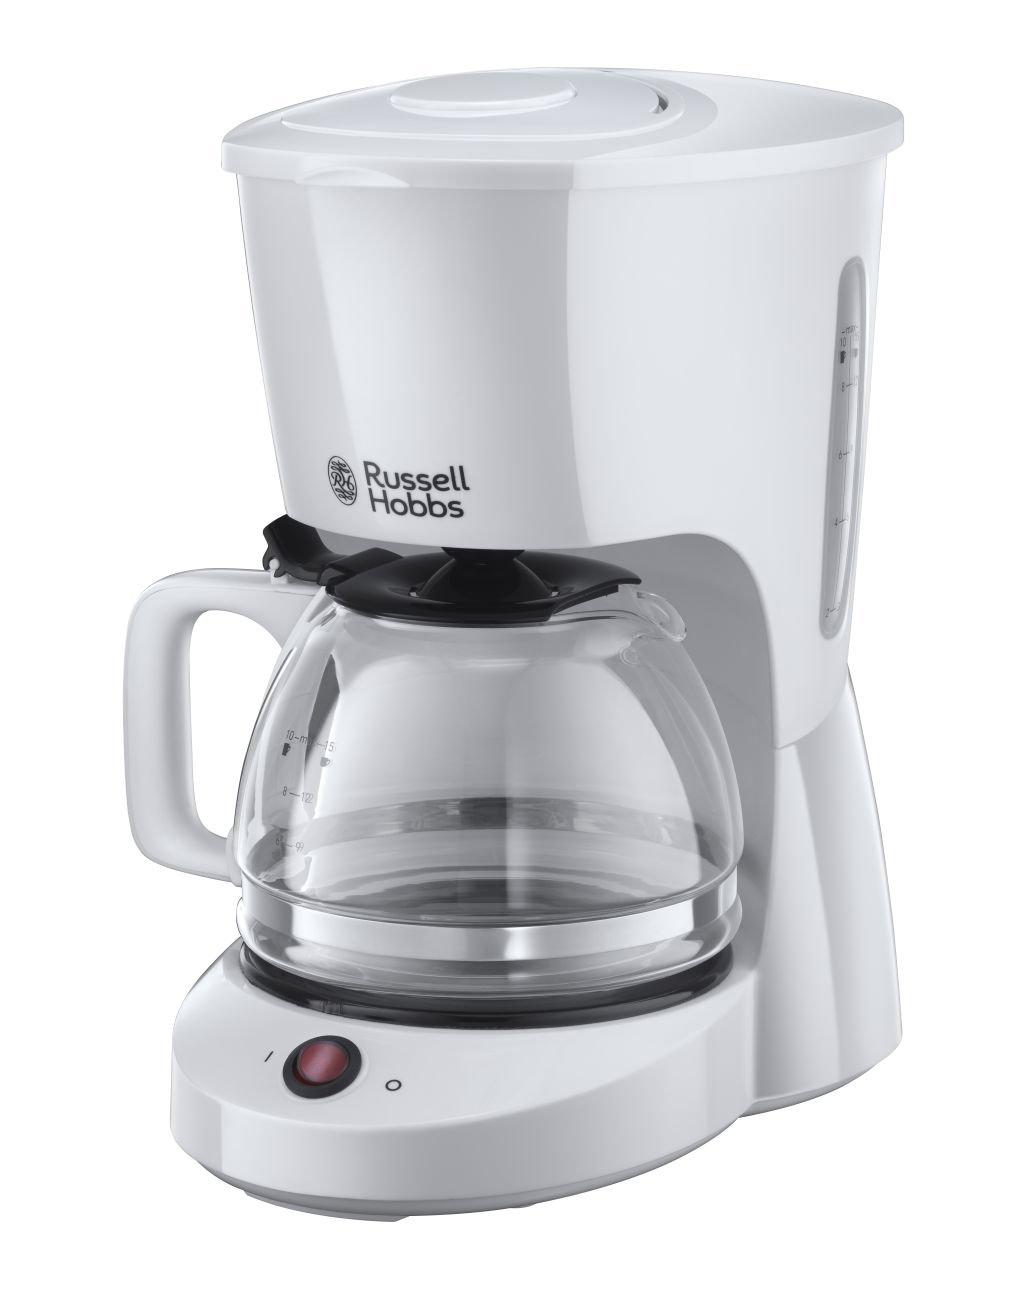 Russell Hobbs 22610-56 Macchina Caffe, 975 Watt, 1.25 Litri, Plastica, Bianco